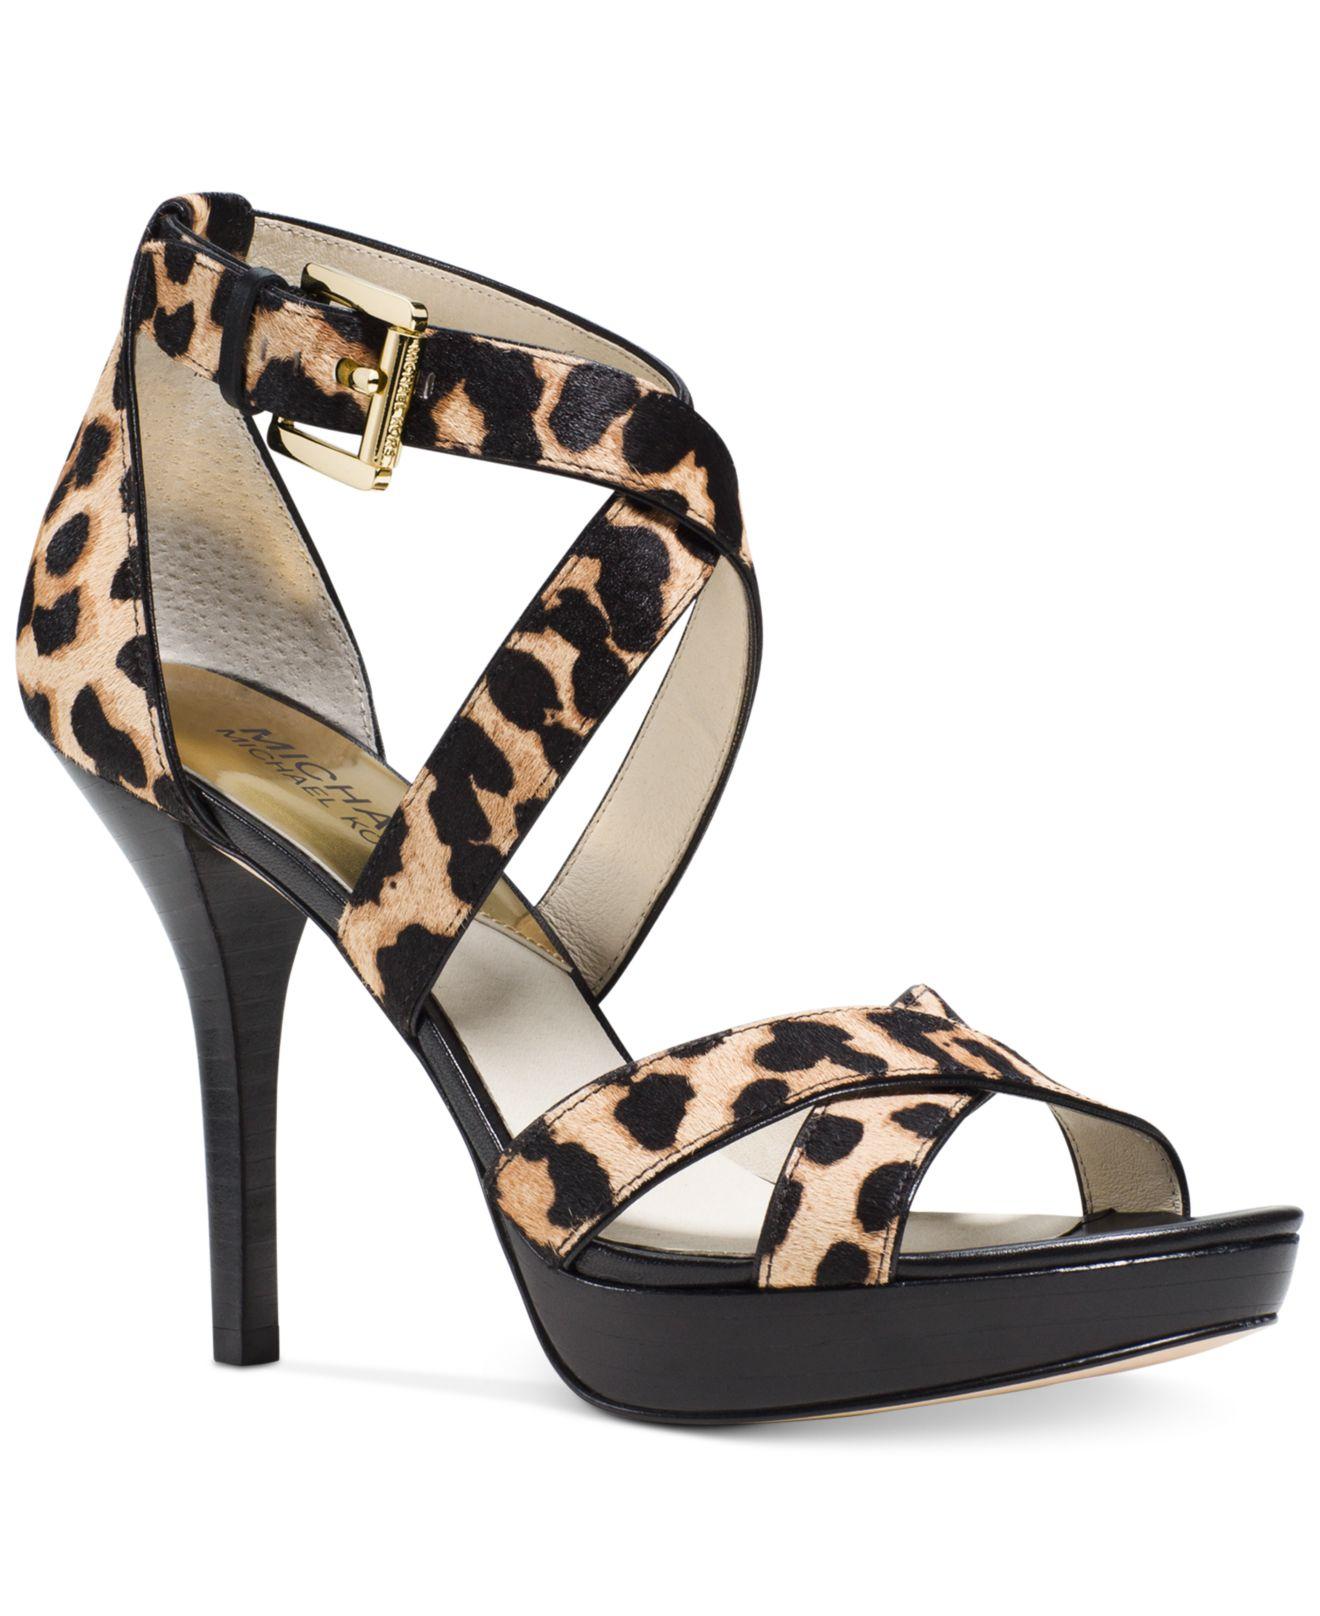 6fd22143f934 Lyst - Michael Kors Michael Evie Platform Sandals